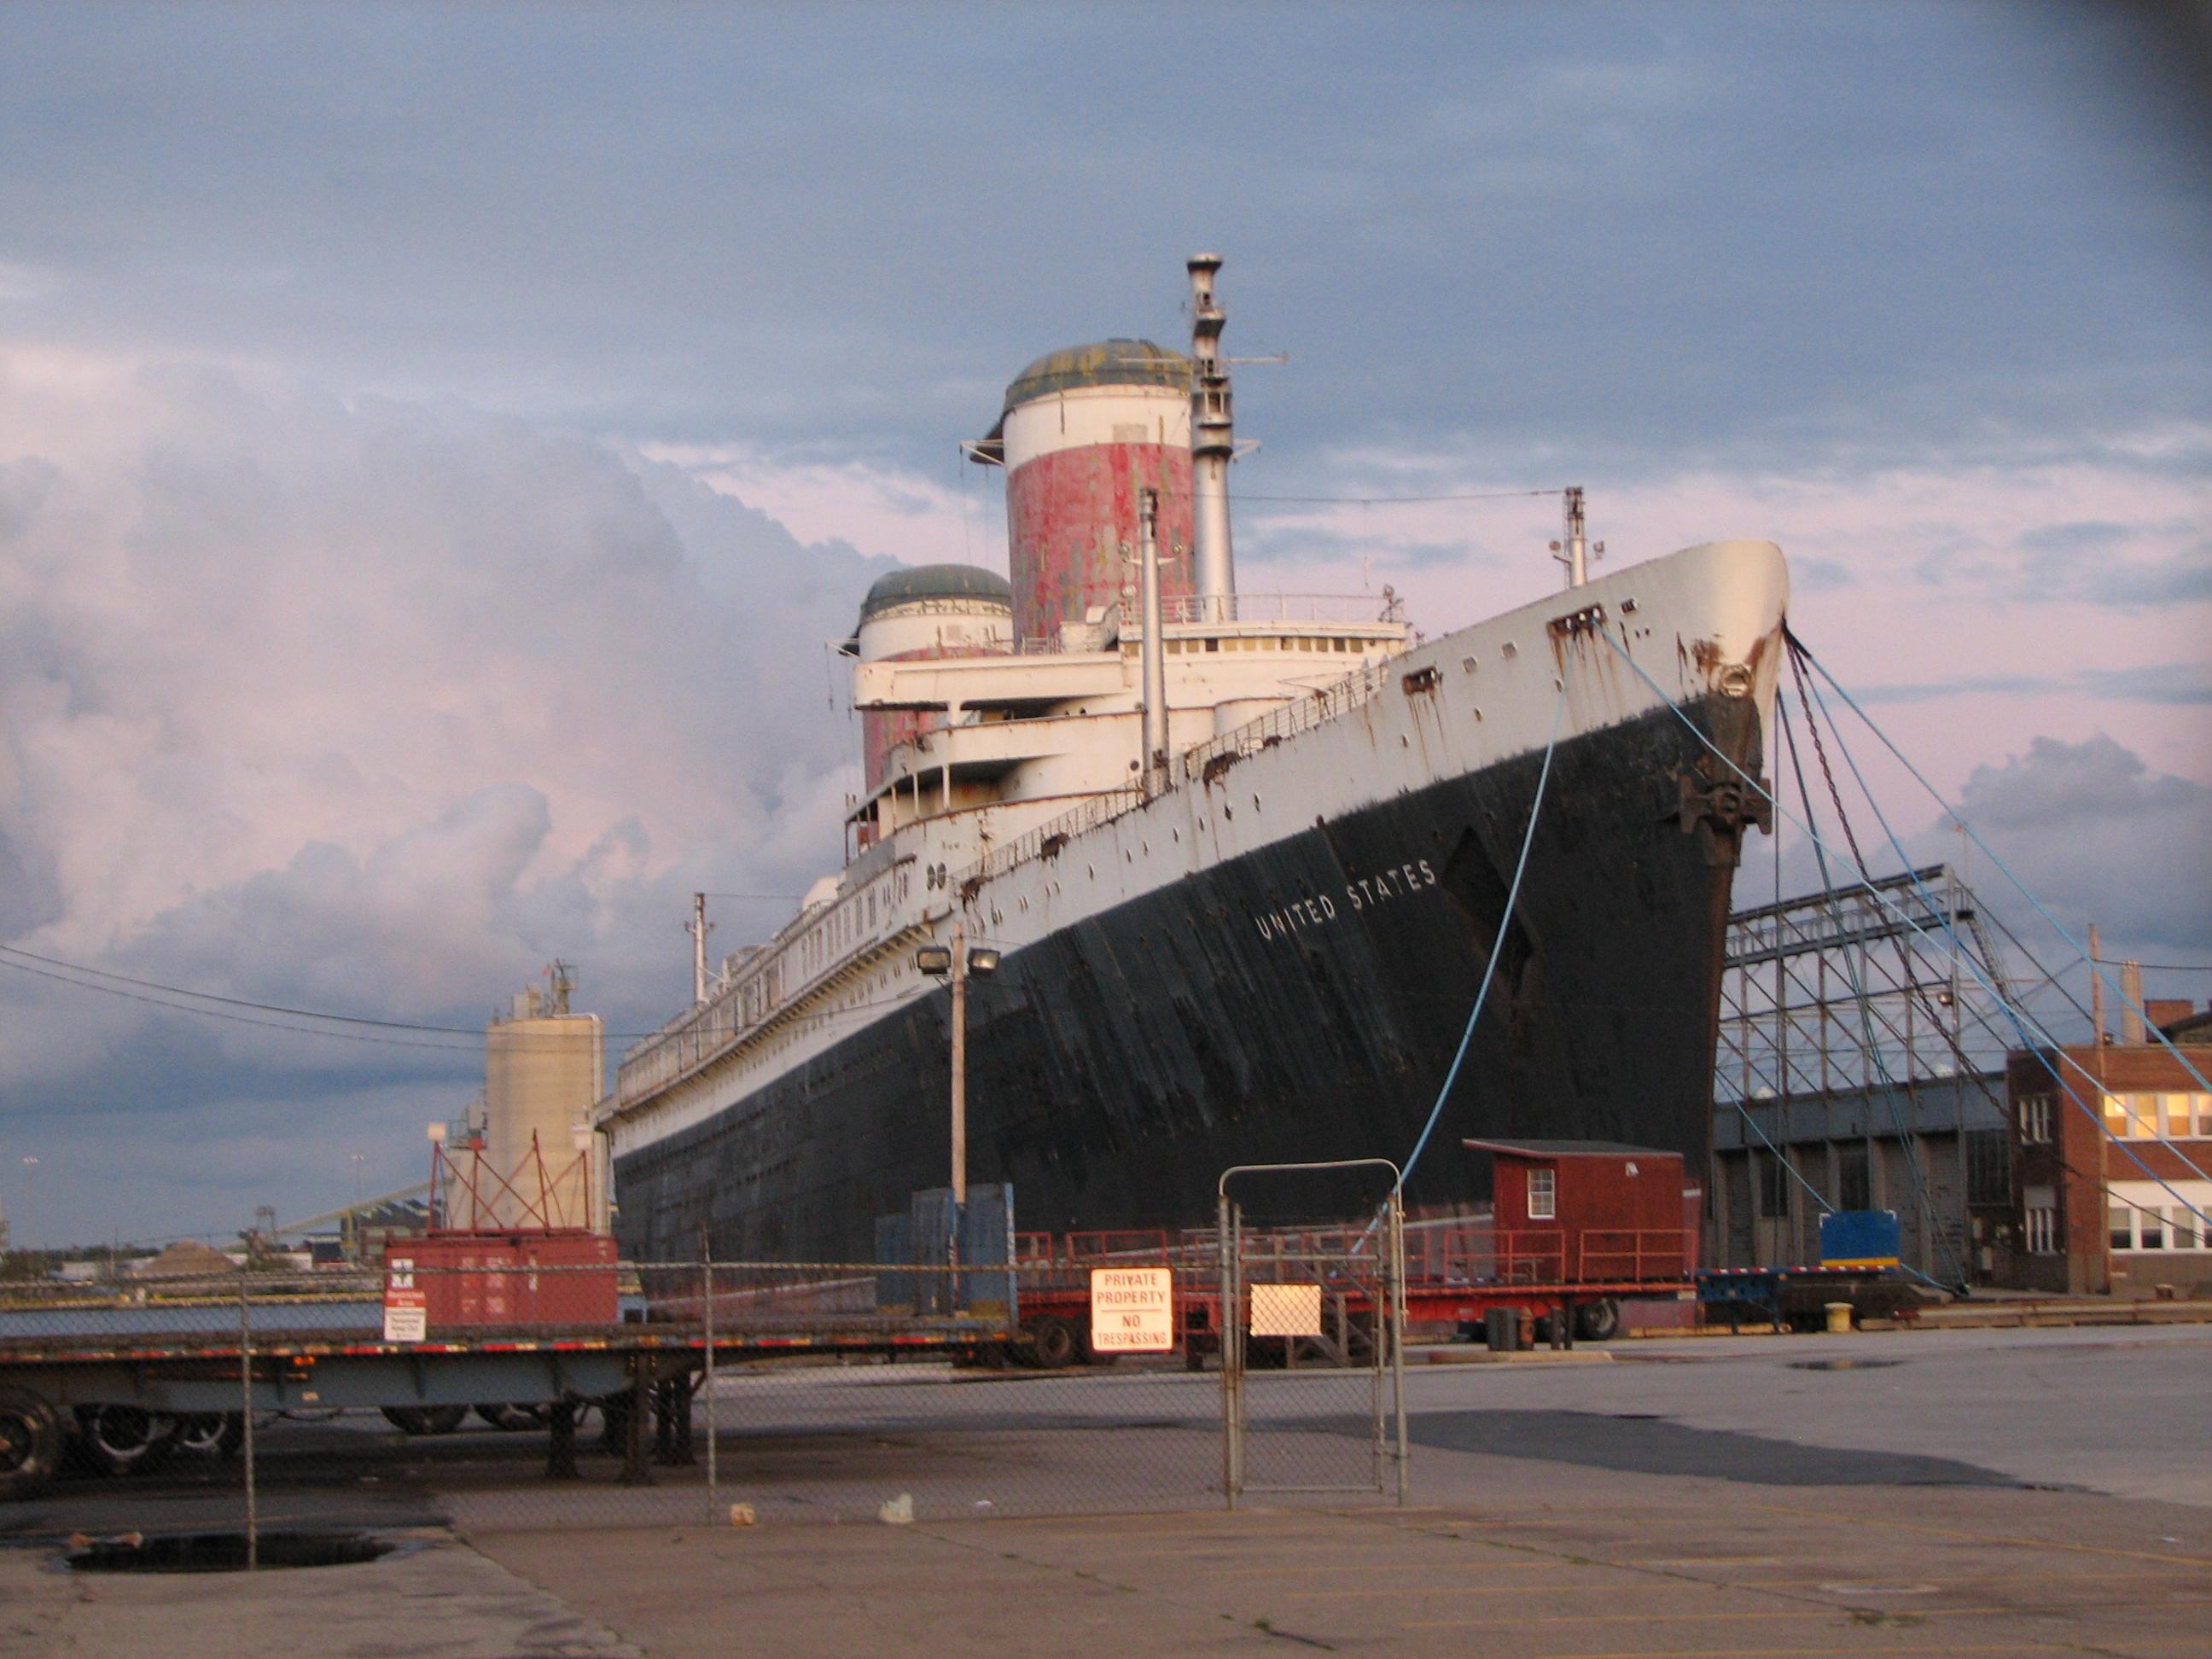 SS United States by Wikipedia contributor Lowlova